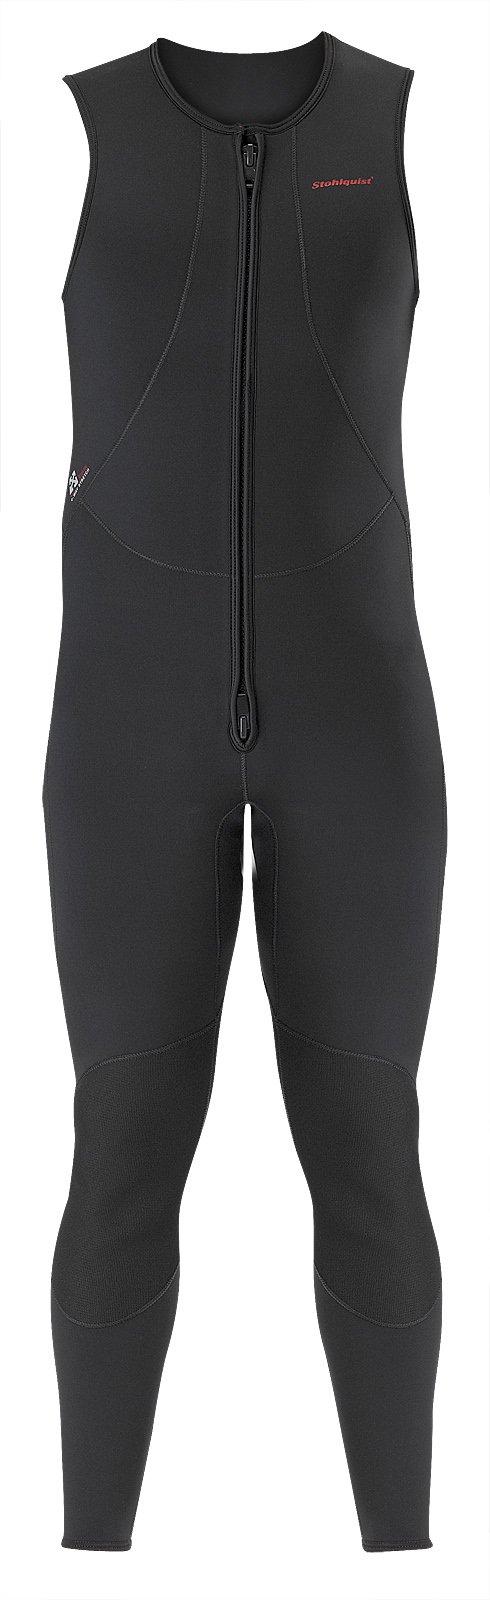 Stohlquist Men's Rapid John Wetsuit, Black, XX-Large by Stohlquist Waterware